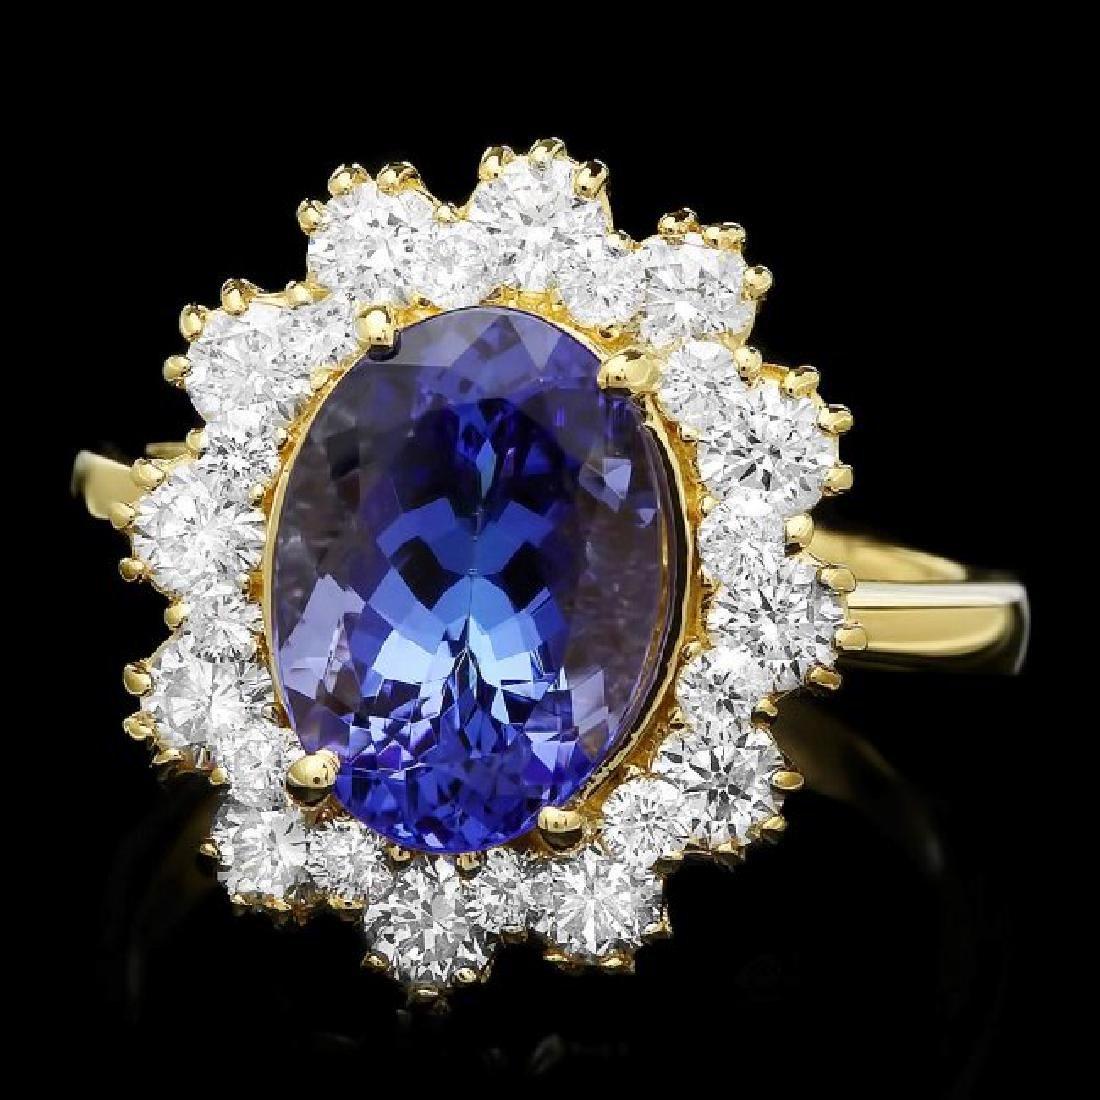 14k Gold 3.69ct Tanzanite 1.35ct Diamond Ring